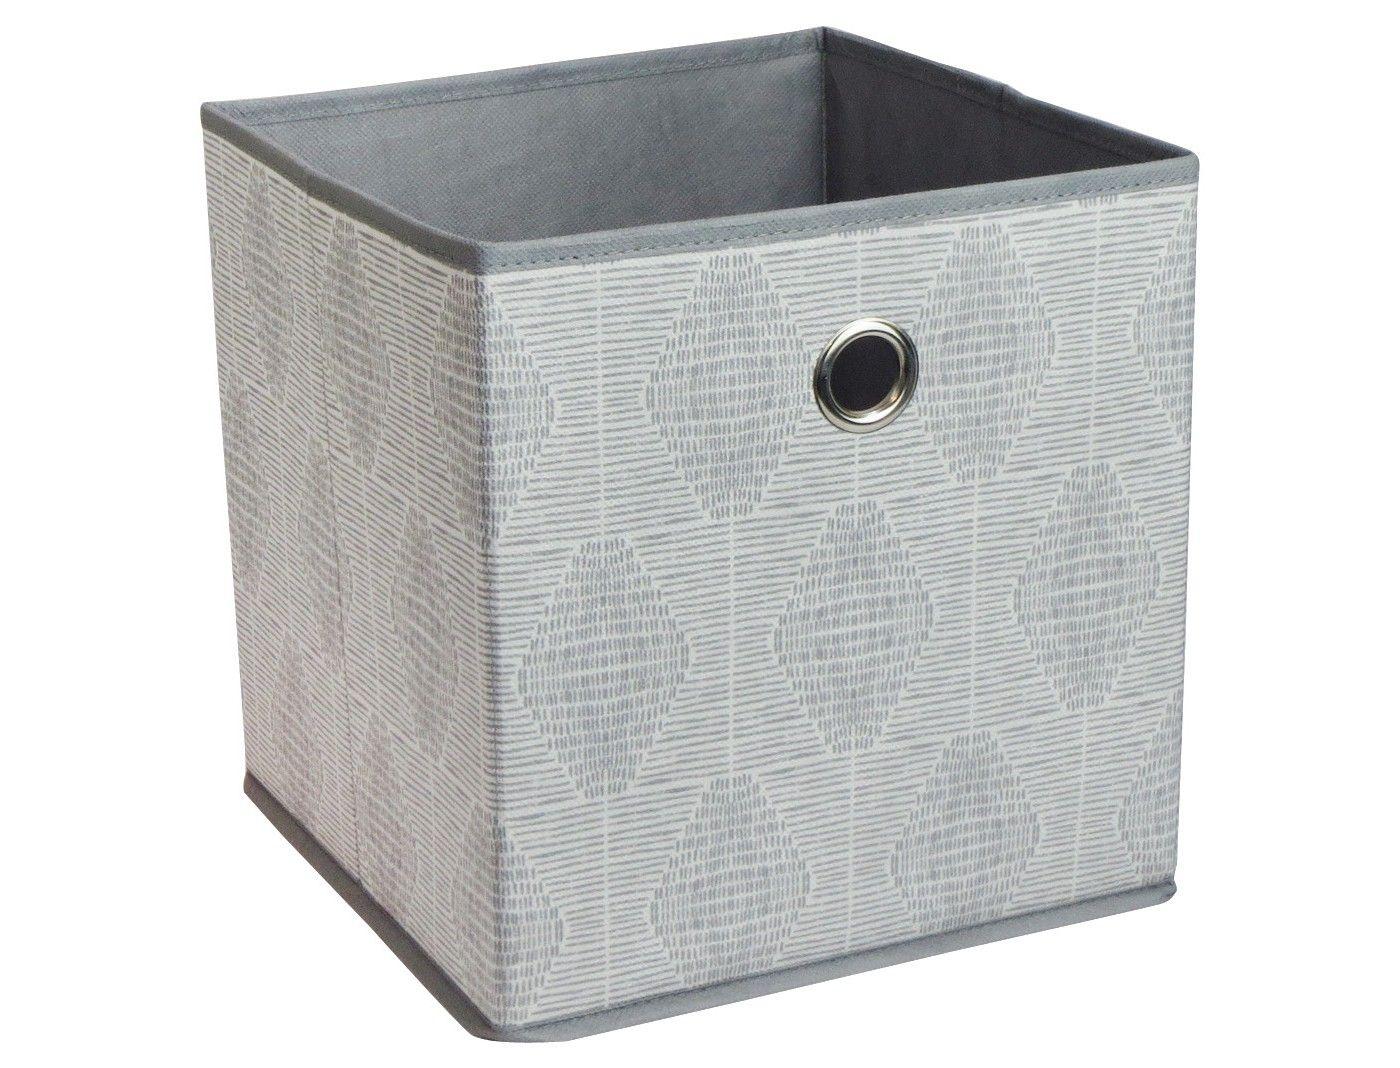 Fabric Cube Storage Bin 11 Room Essentials Cube Storage Bins Cube Storage Room Essentials